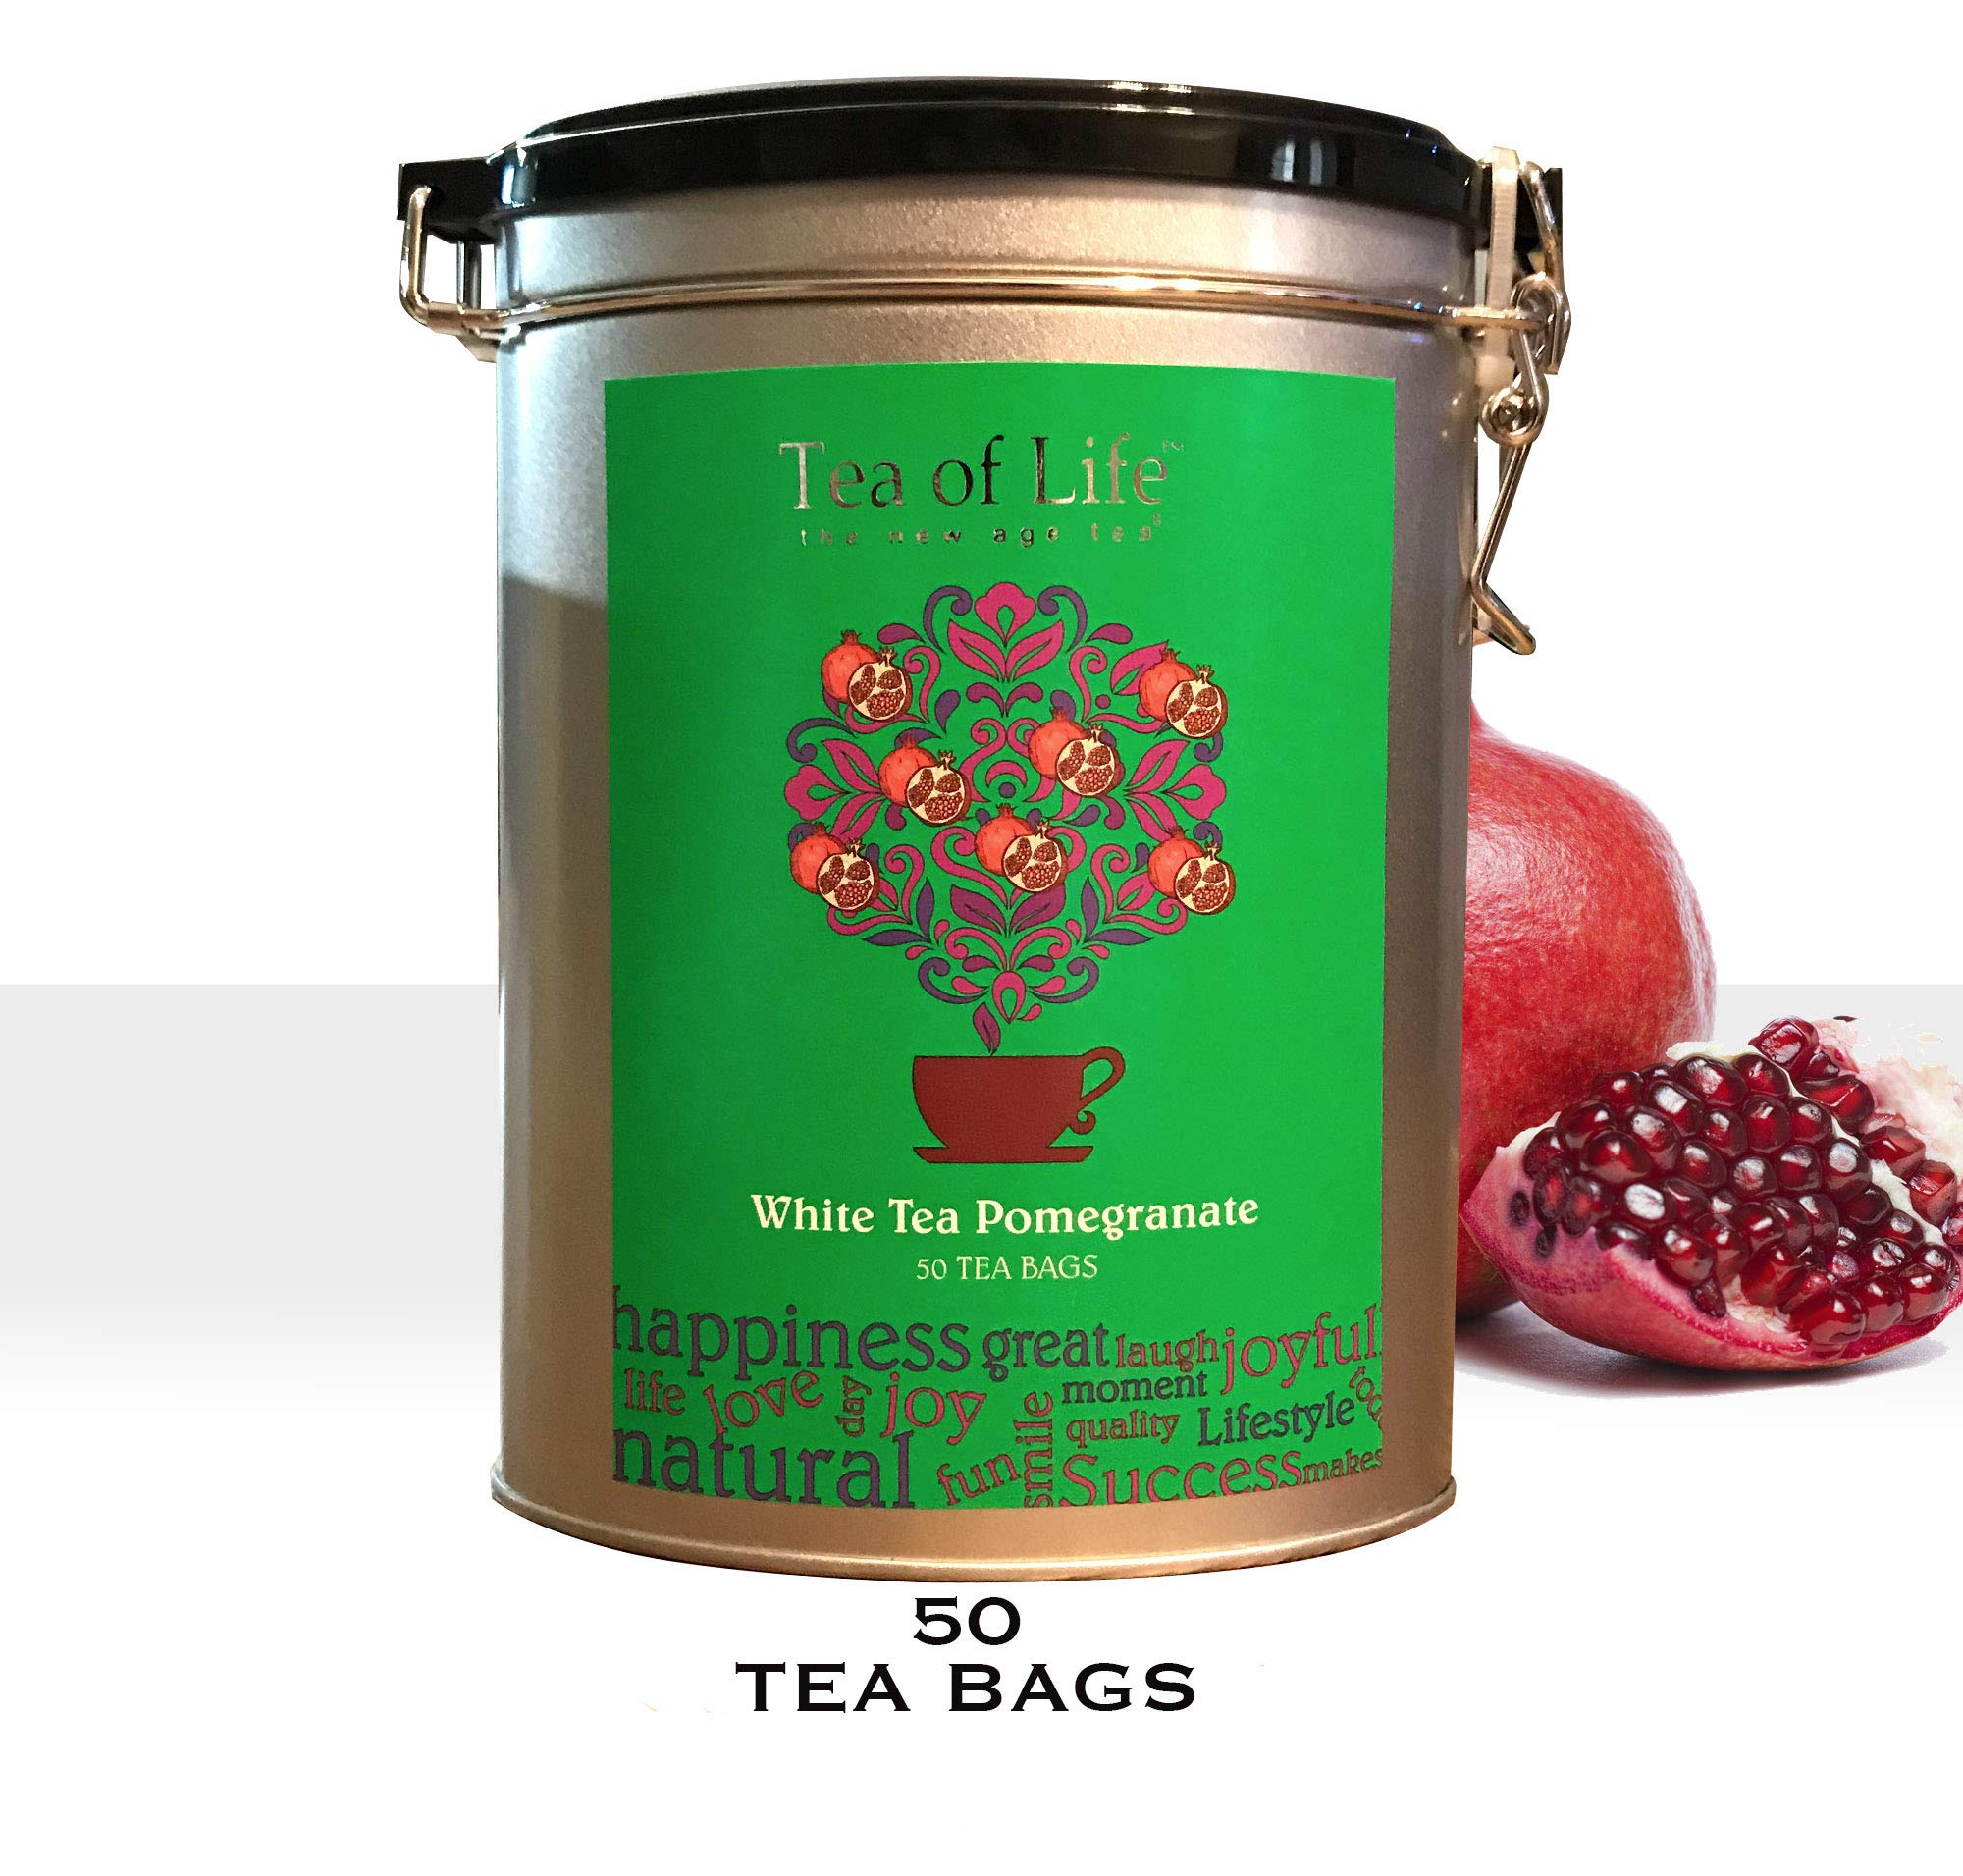 TEA OF LIFE 50 Pure Ceylon White Tea Pomegranate Bags/Oval Metal Clip Tin Gift Ready (White Tea Pomegranate)